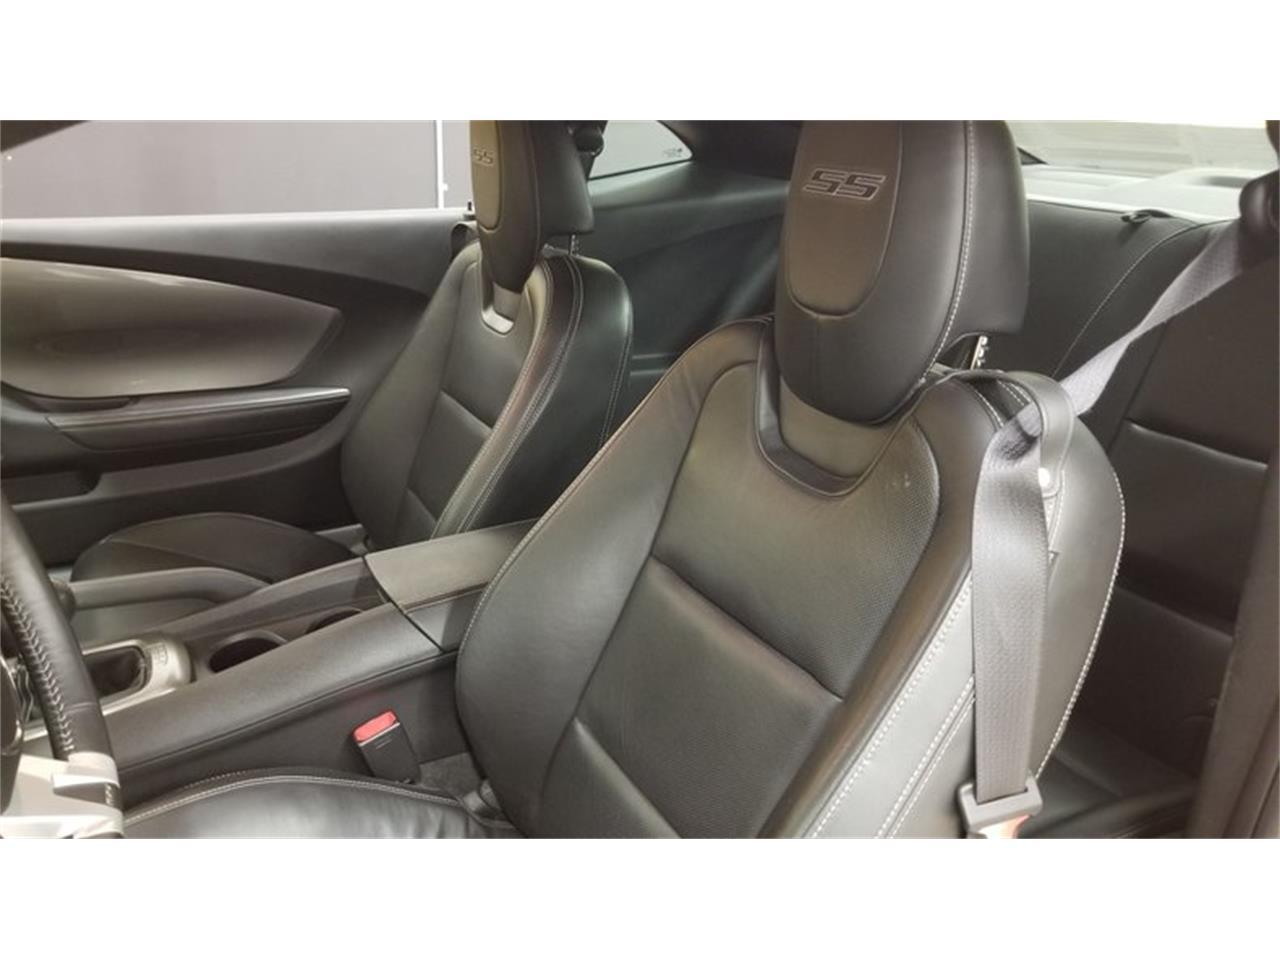 2010 Chevrolet Camaro (CC-1412397) for sale in Mankato, Minnesota